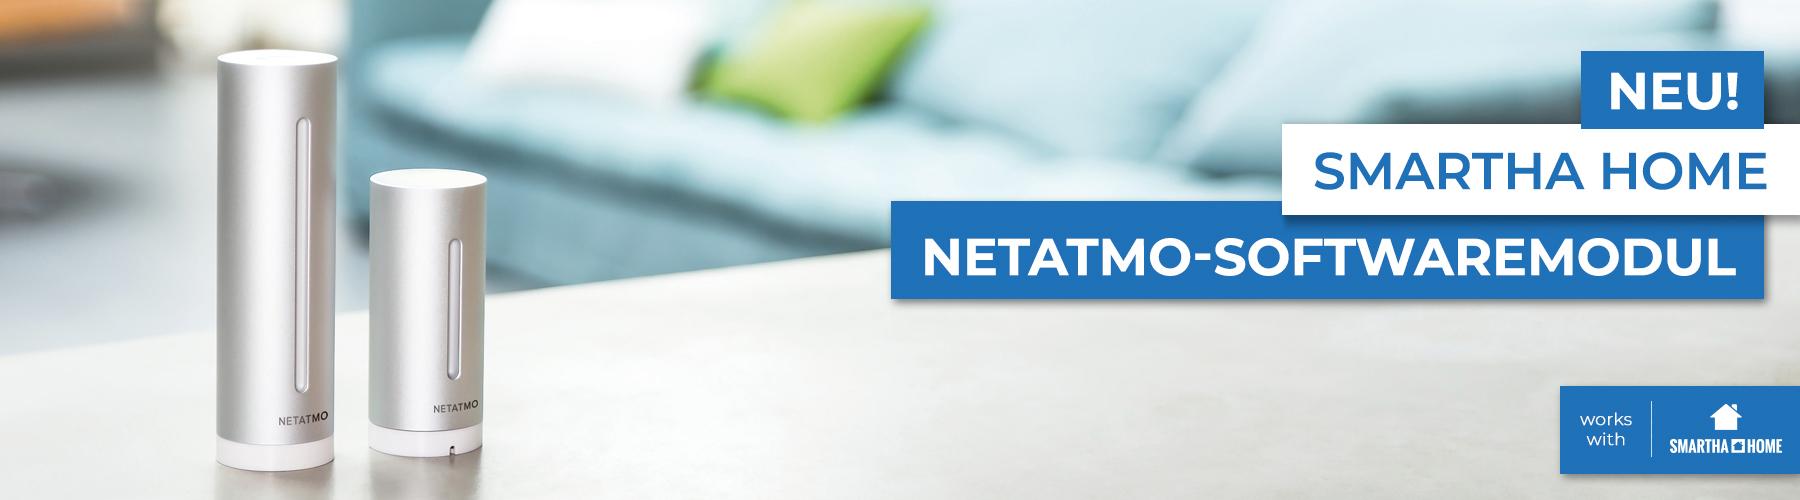 smartha home Softwaremodul Netatmo